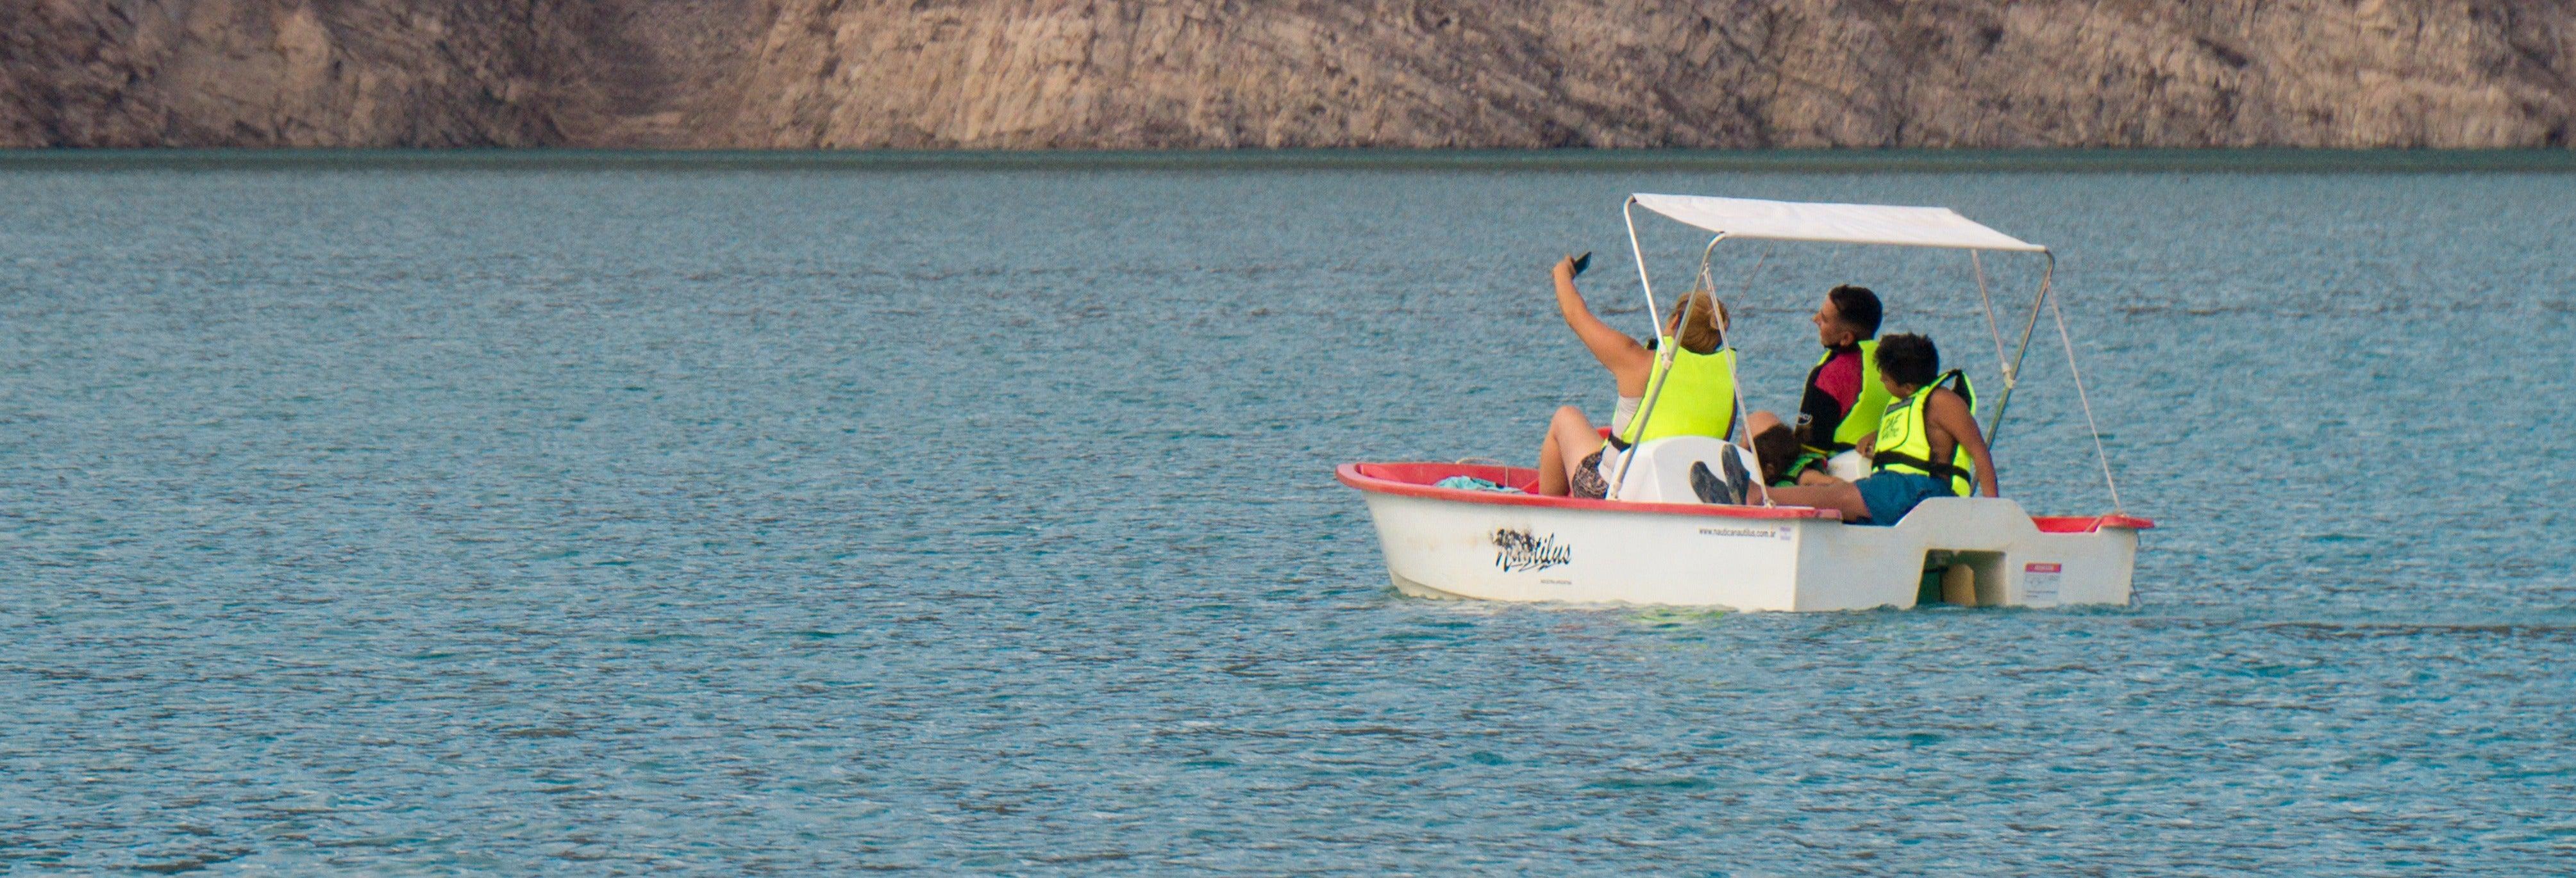 Alquiler de barca a pedales en el Dique Punta Negra